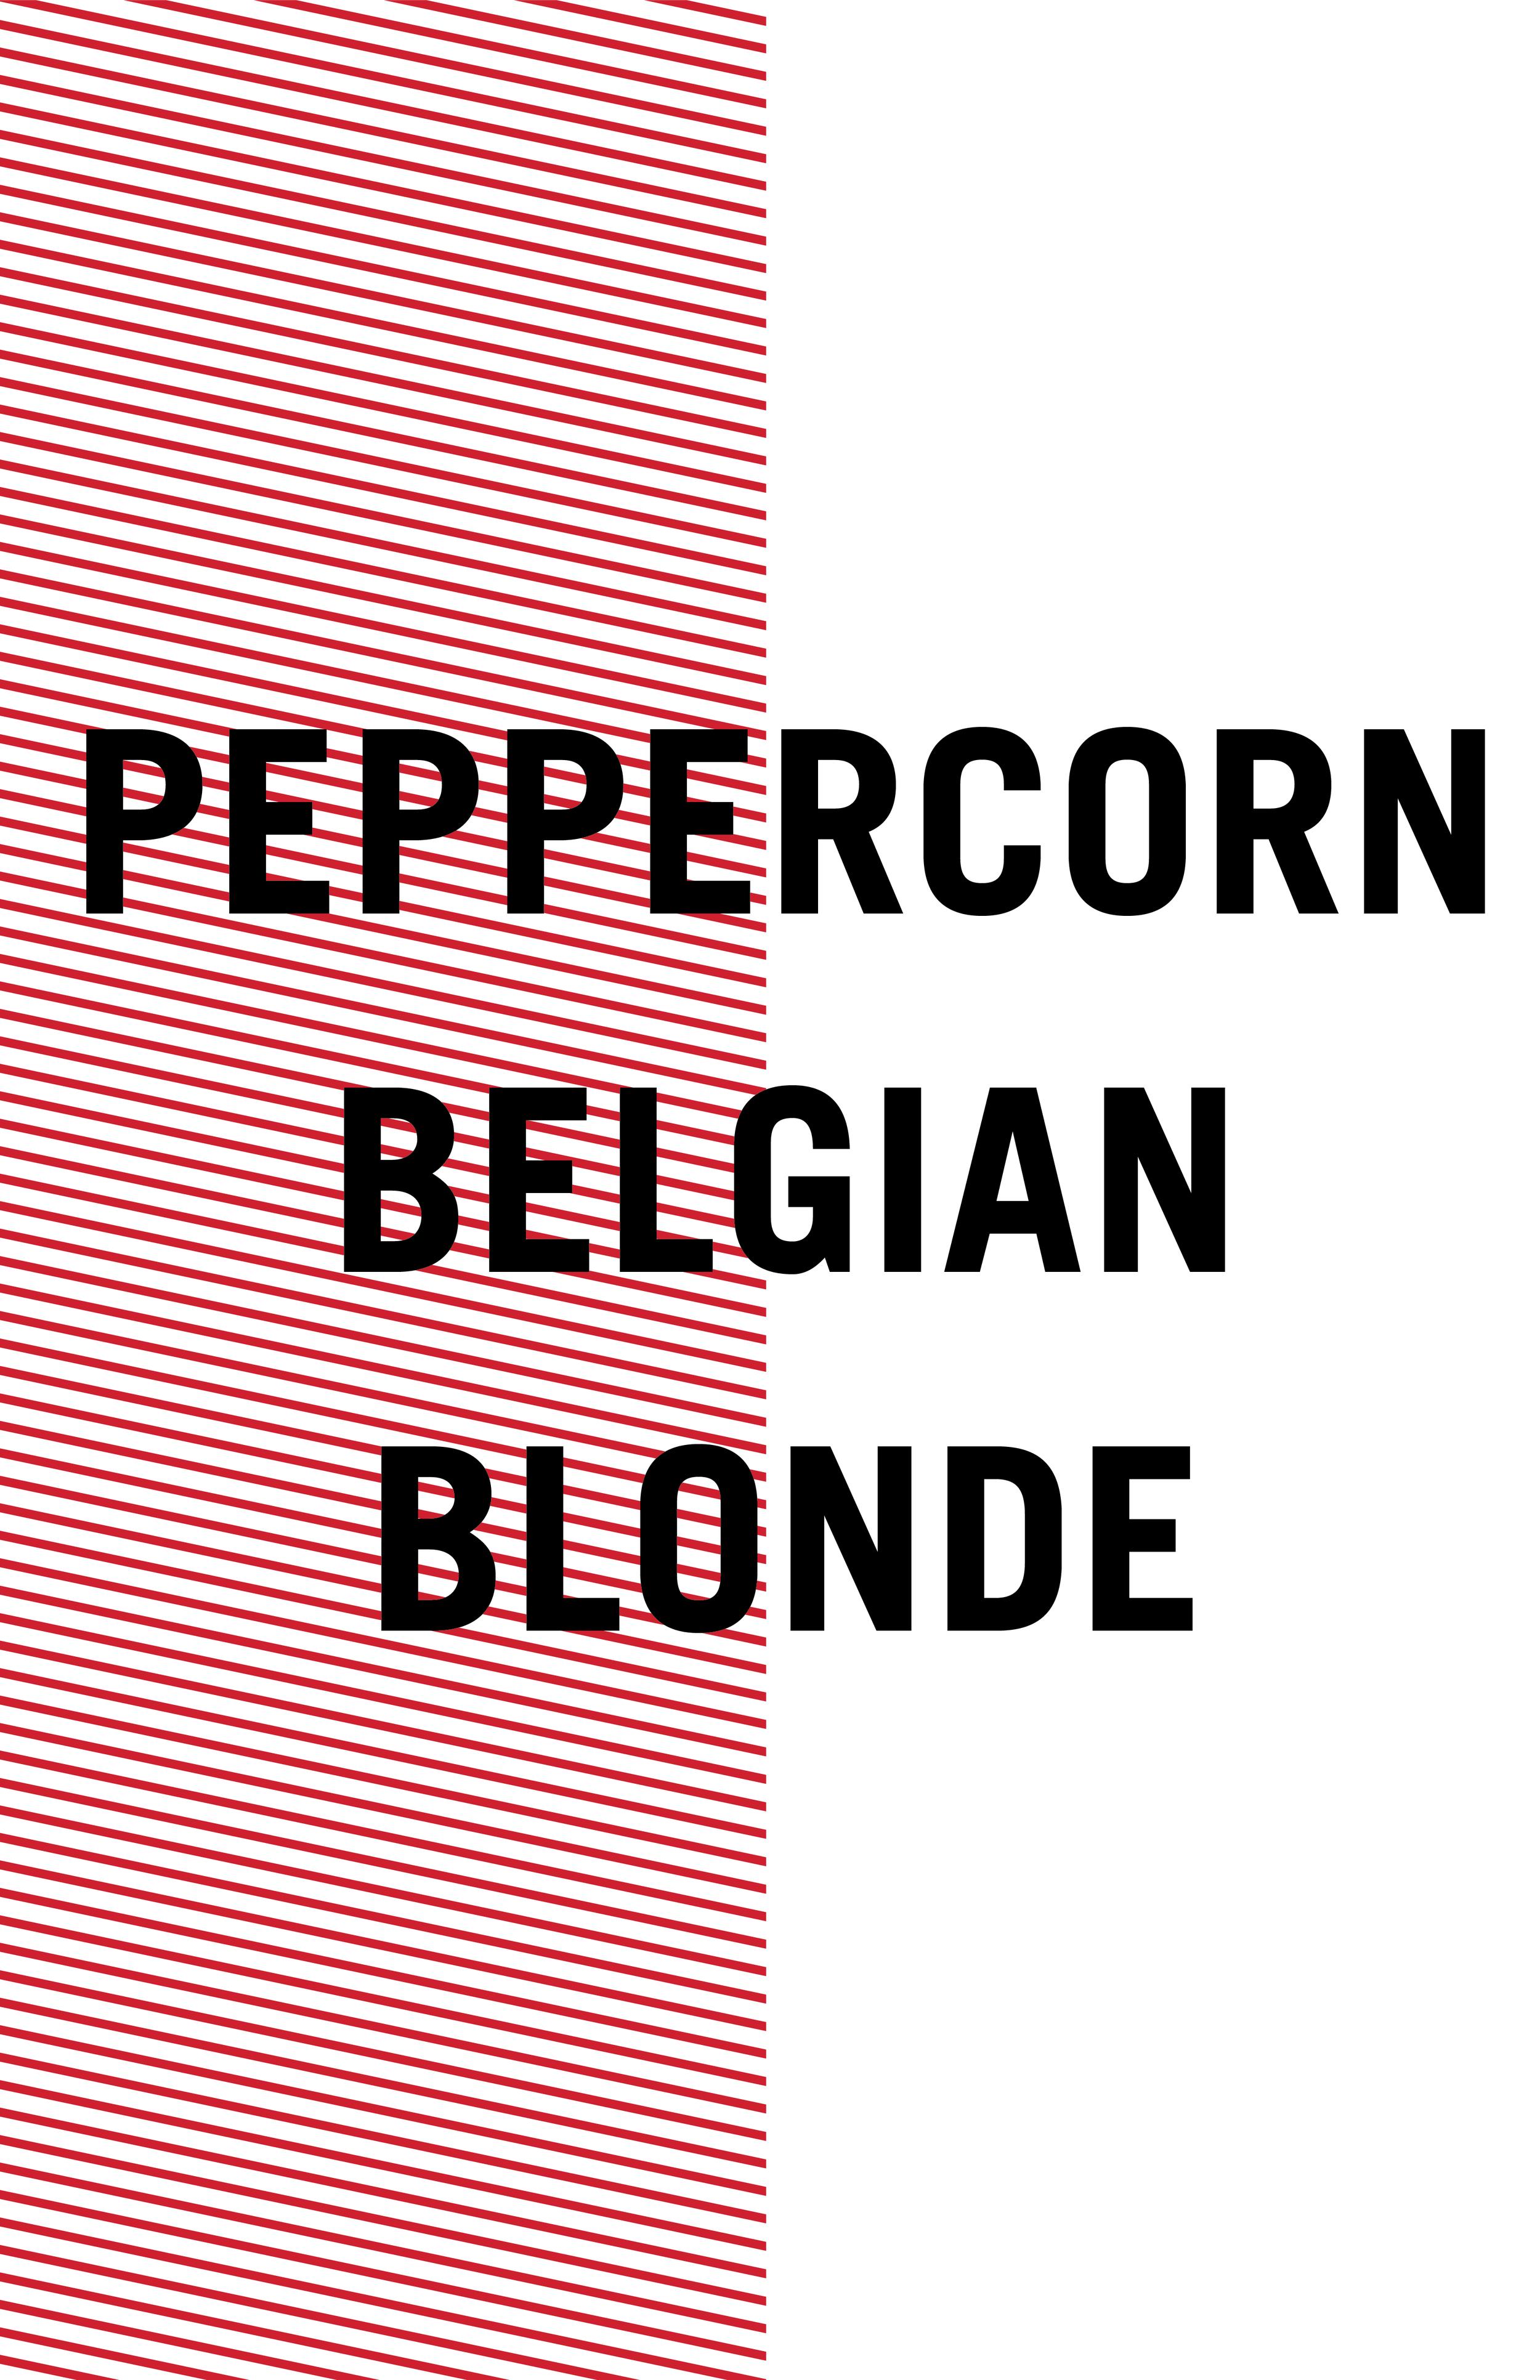 PeppercornBlonde-03.png